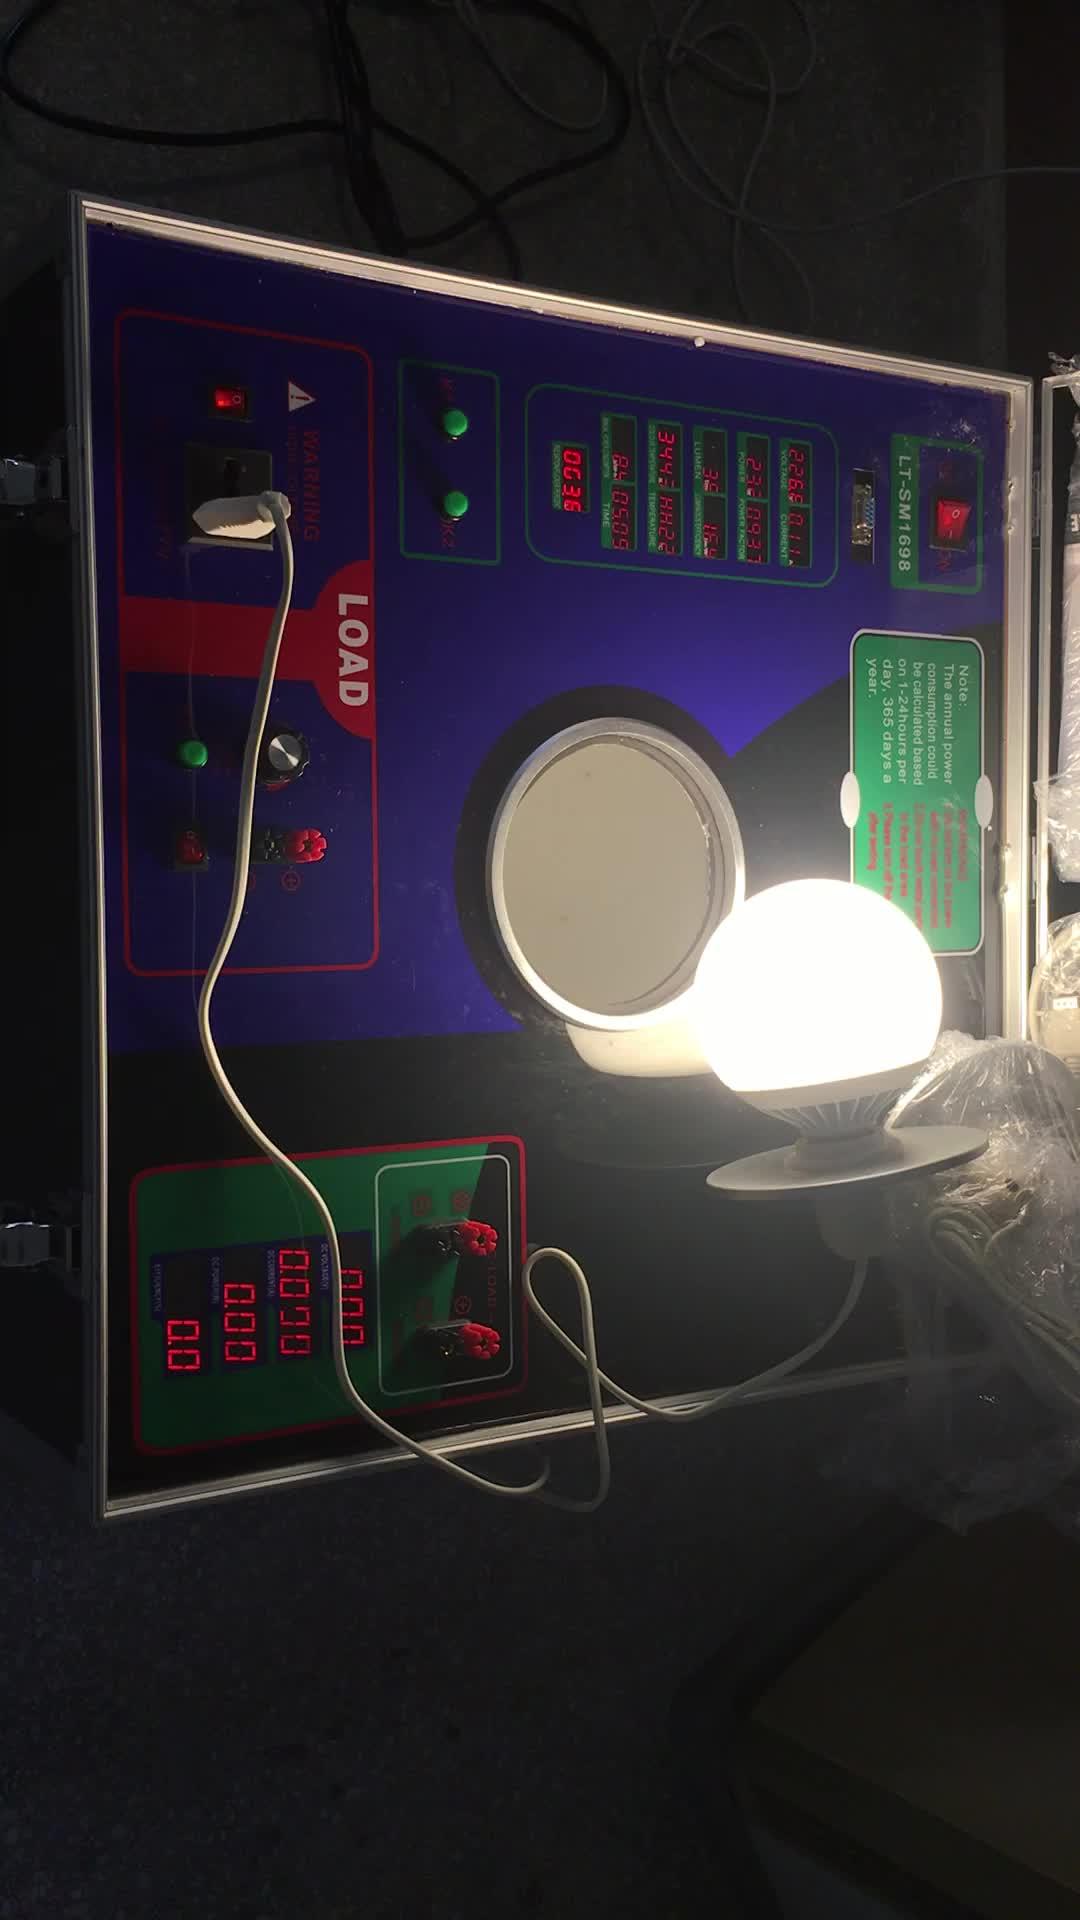 Handheld OEM LED Tester LUX T8 Buis 220V Power Meter Lumen Tester